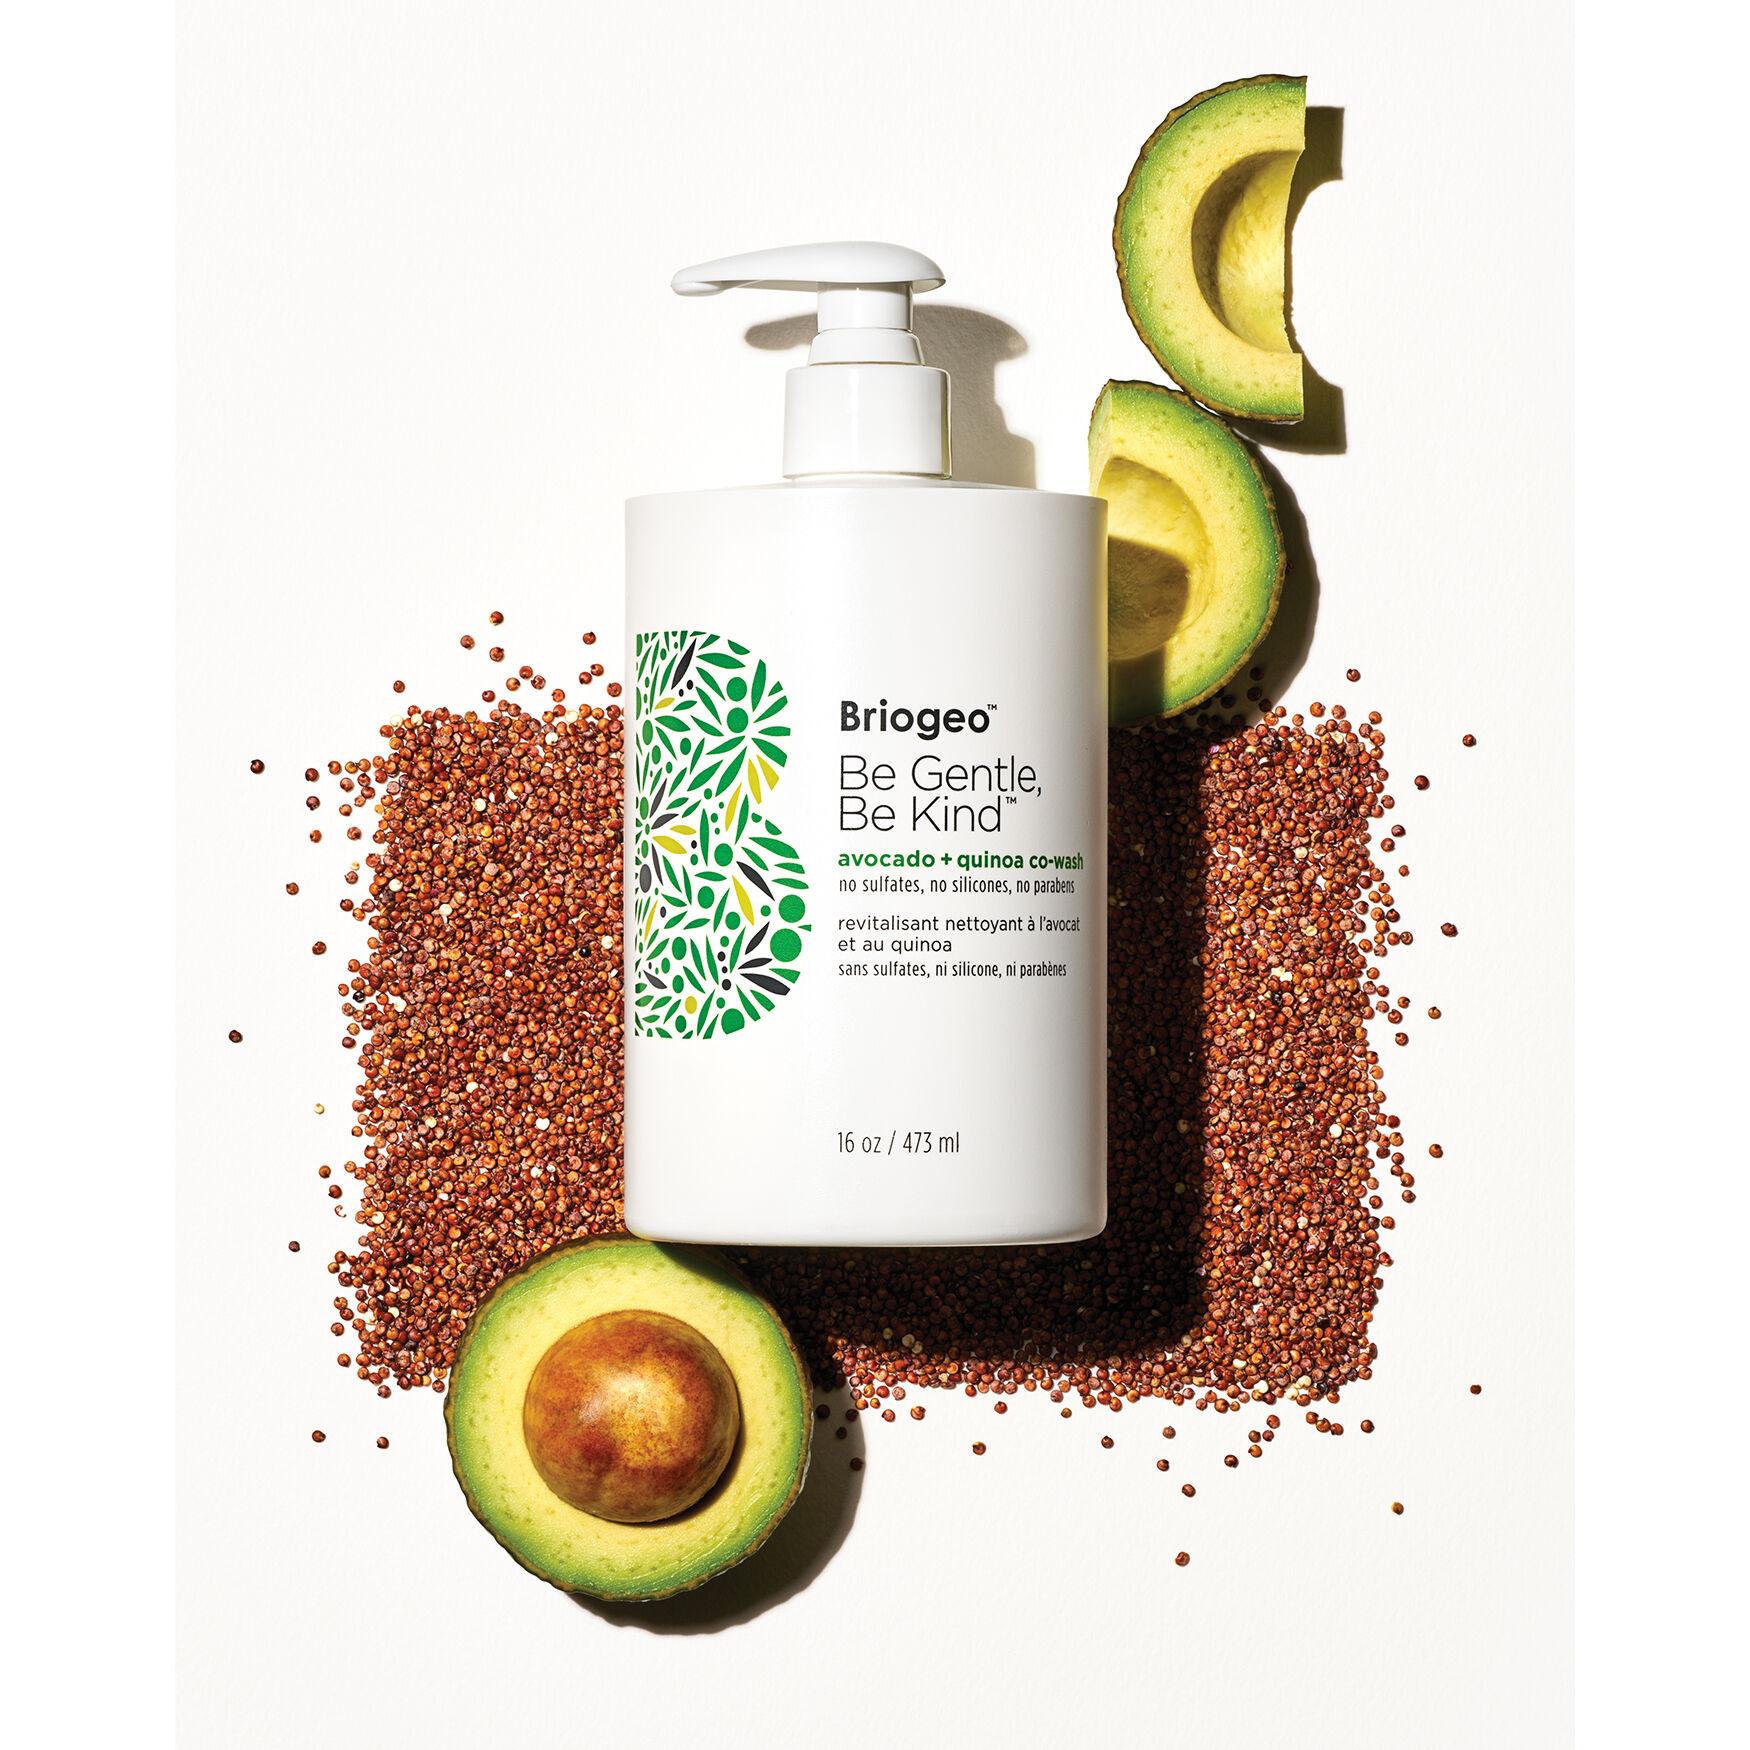 Buy WOW Skin Science Avocado Gentle Hand Cream With Avocado